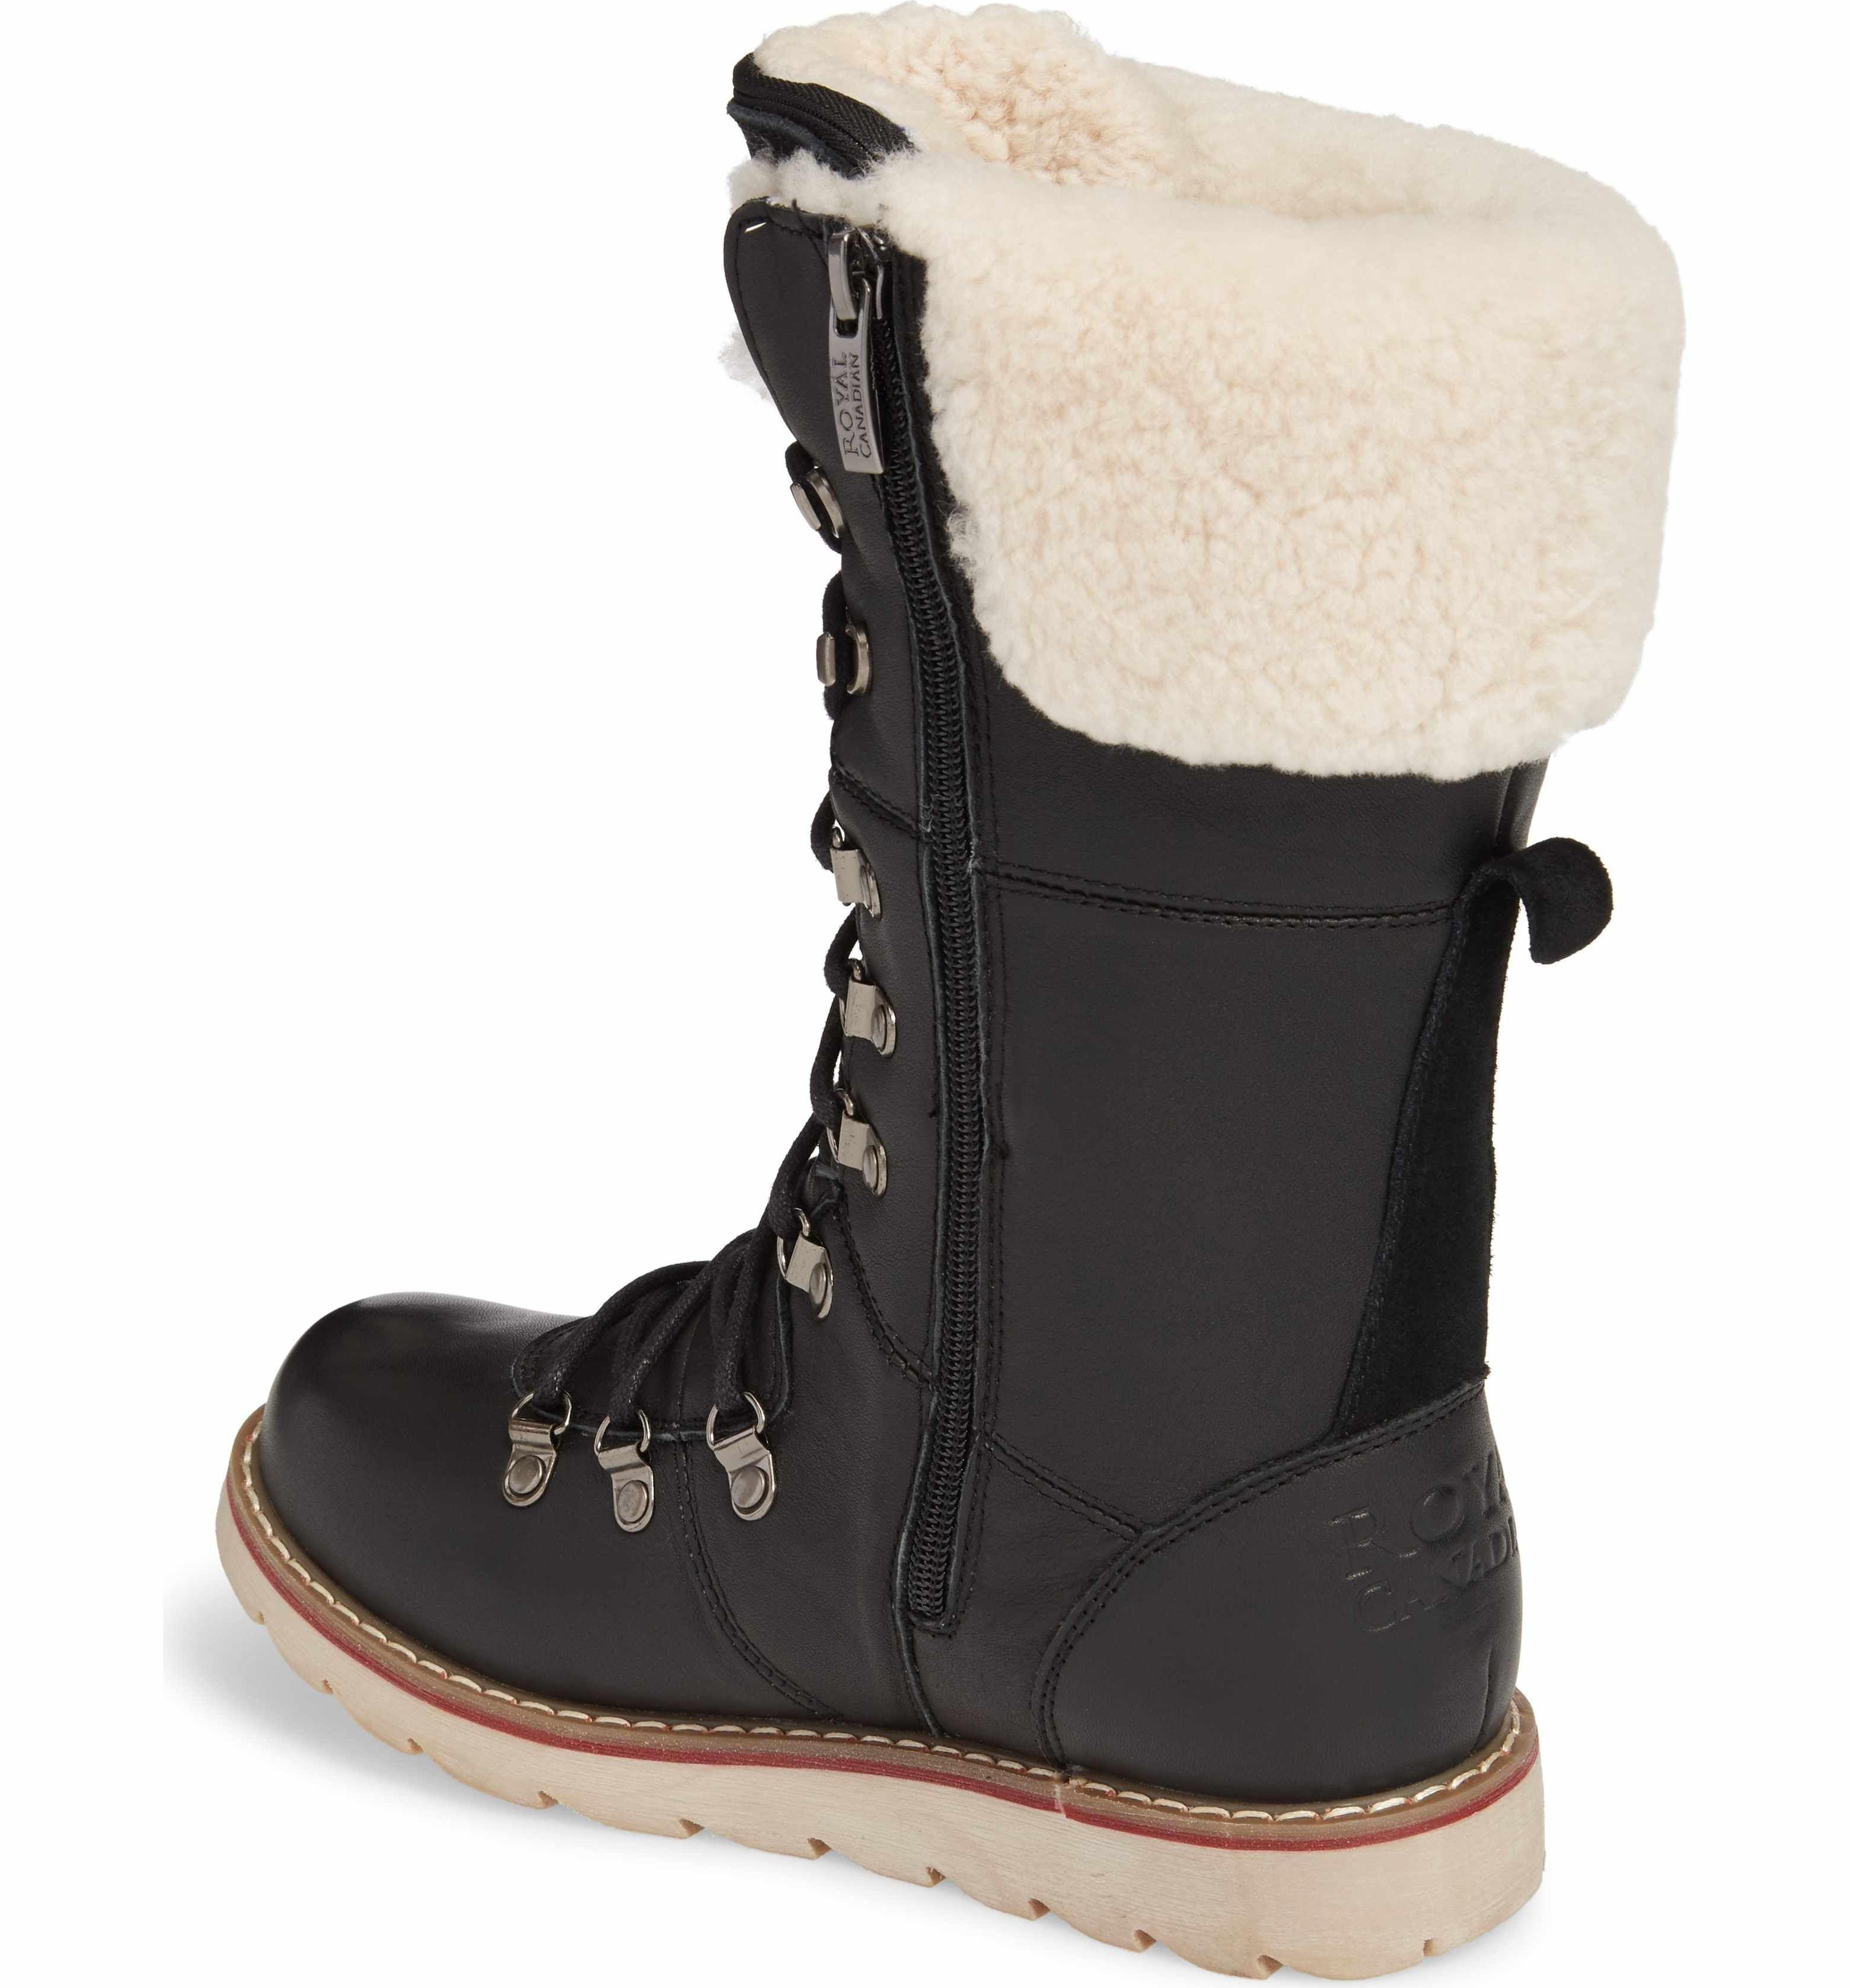 Royal Canadian Louise Waterproof Snow